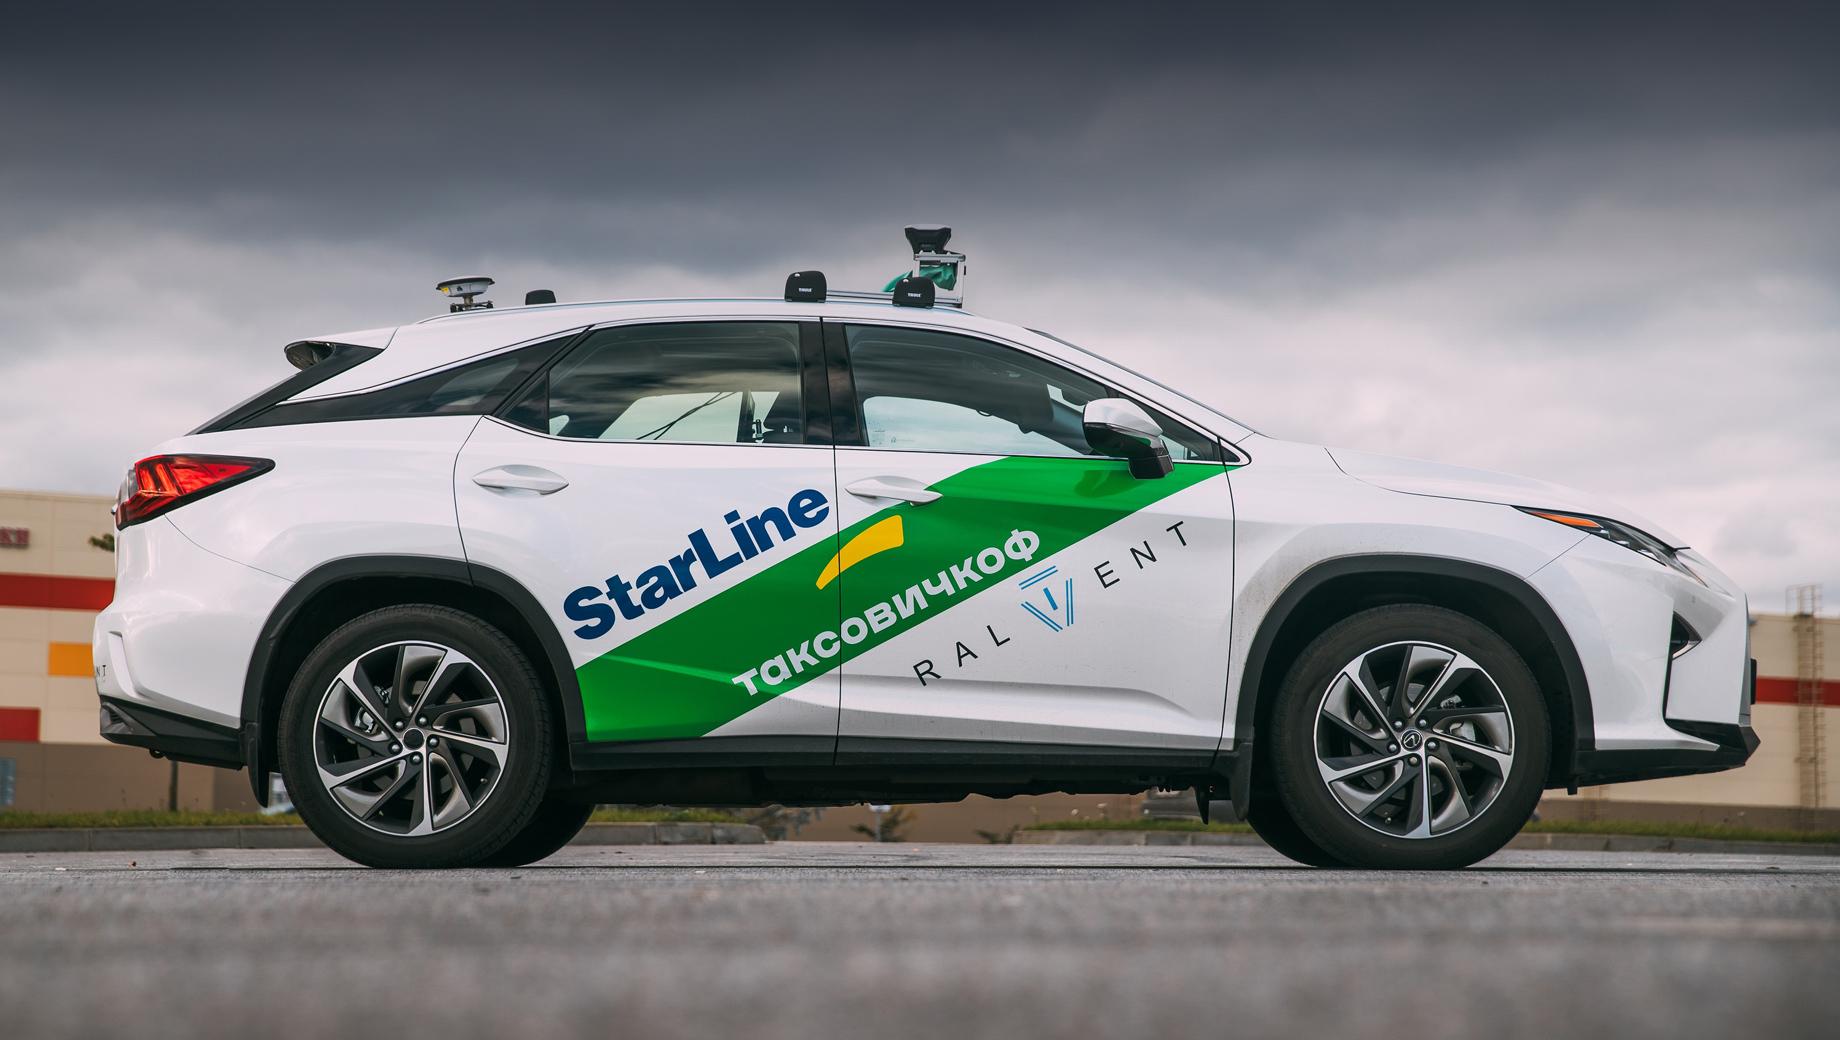 Компания «СтарЛайн» затеяла крупный проект по такси-роботам